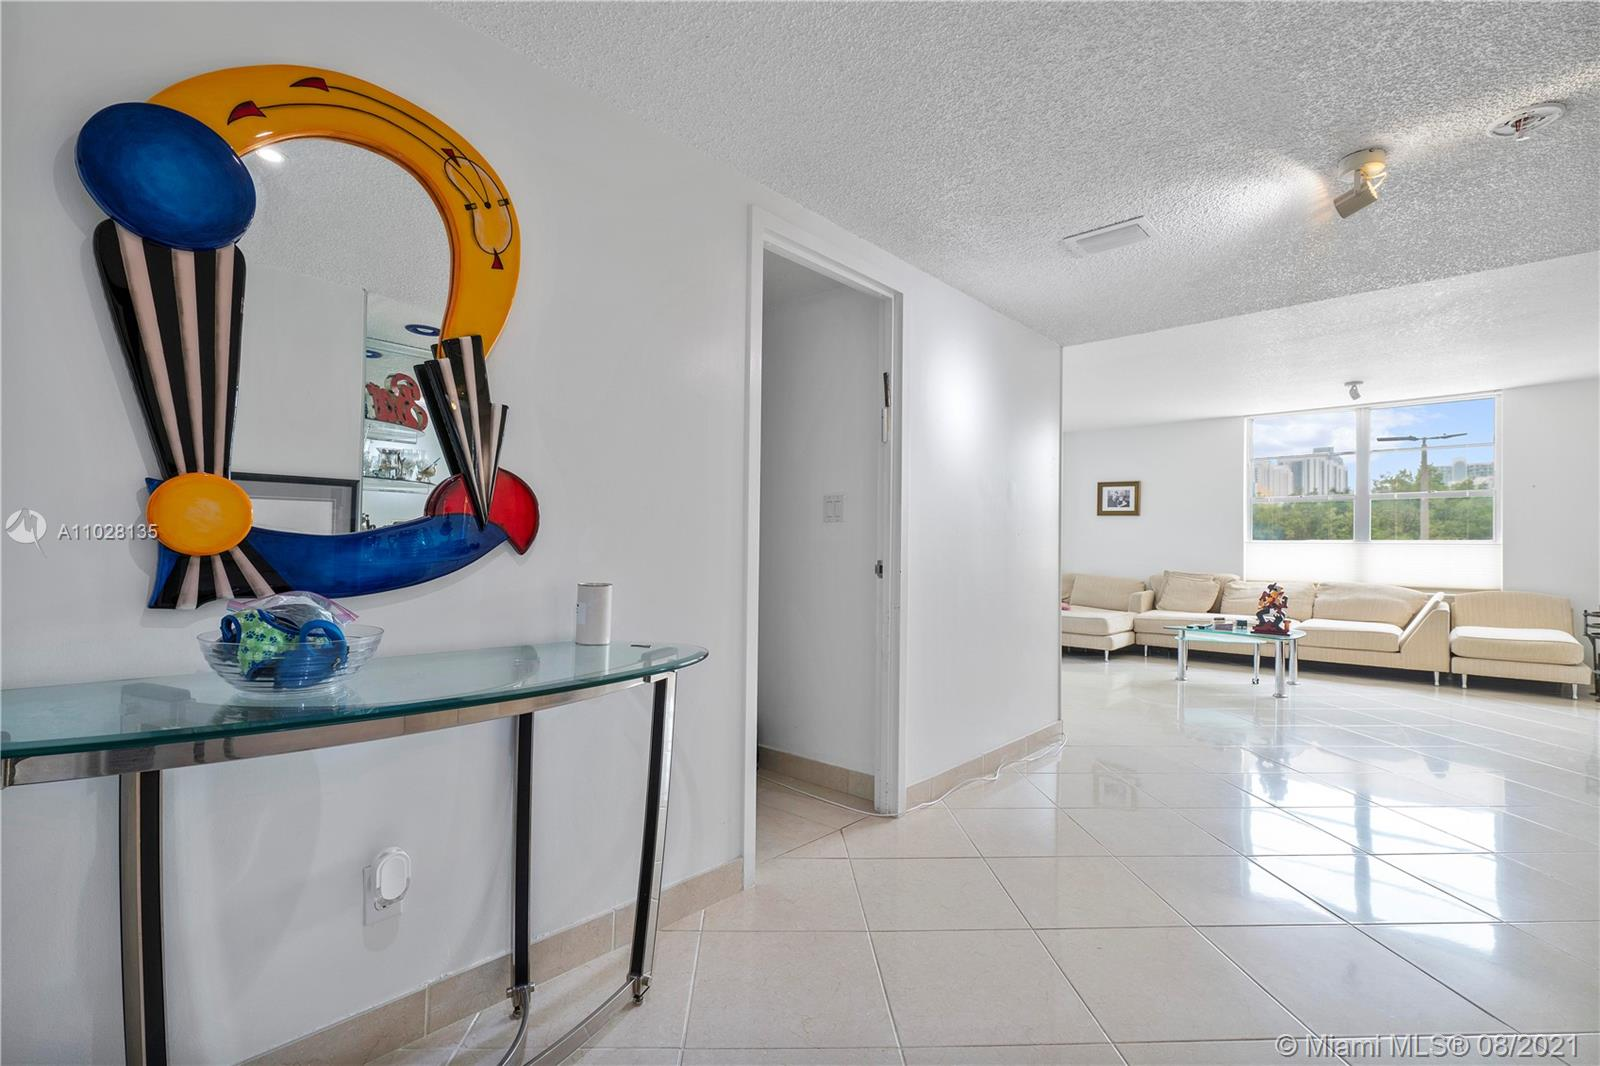 Winston Tower 300 #MO3 - 230 174th St #MO3, Sunny Isles Beach, FL 33160